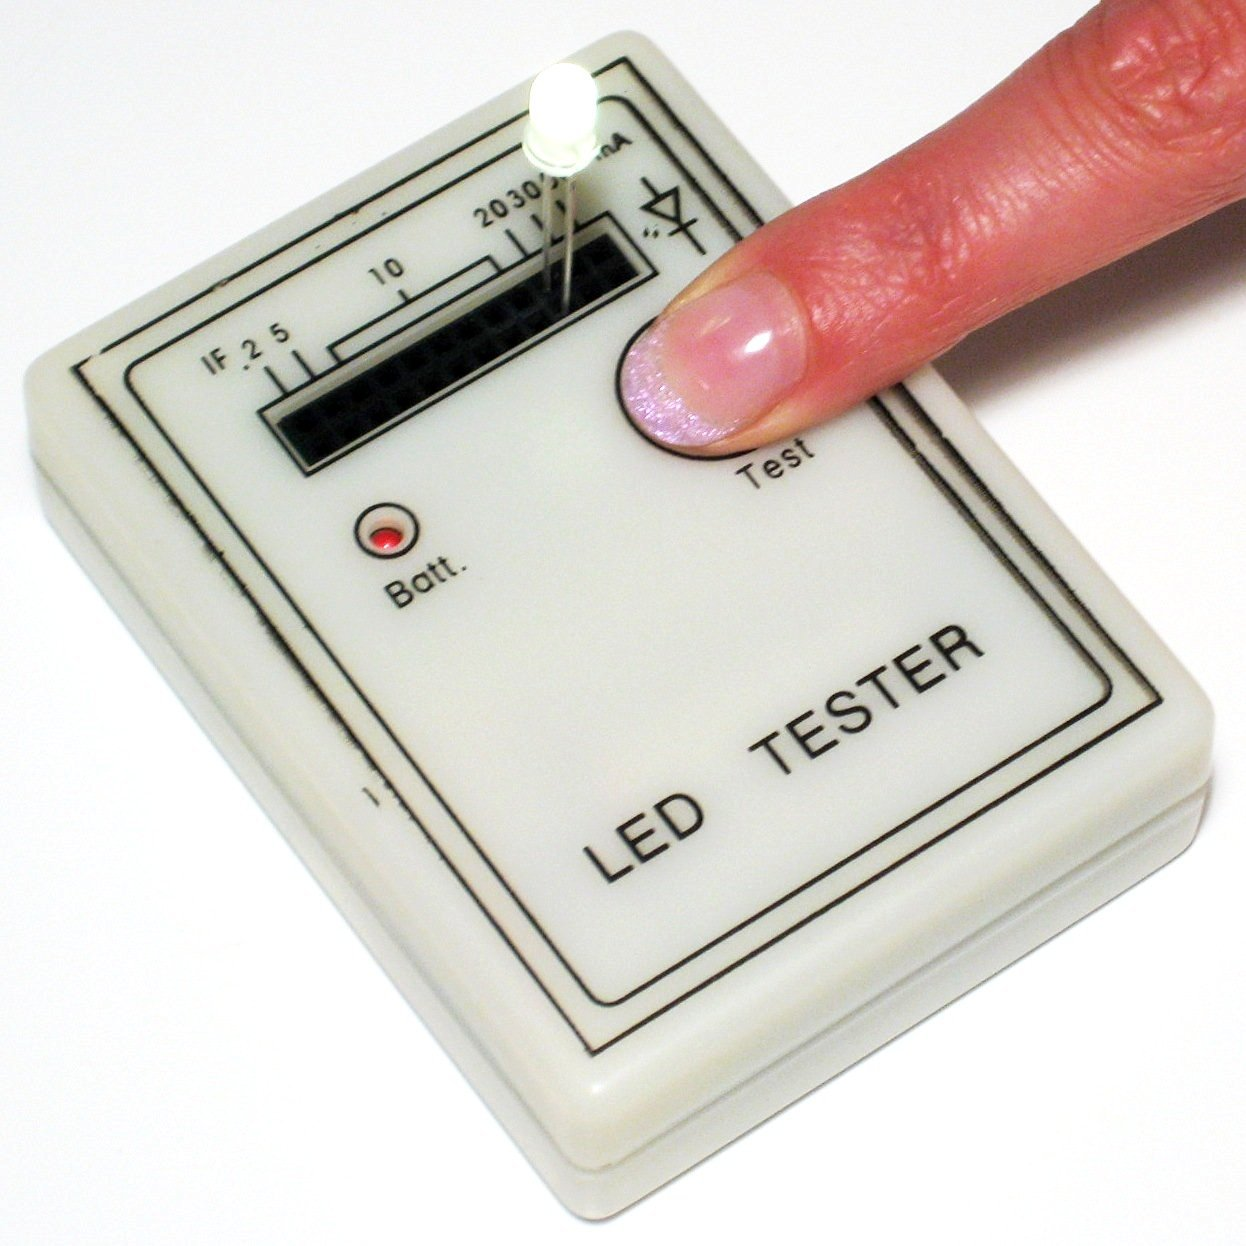 PROFI LED Tester Testgerät LEDs Funktion Farbe leuchten testen Prüfung Test